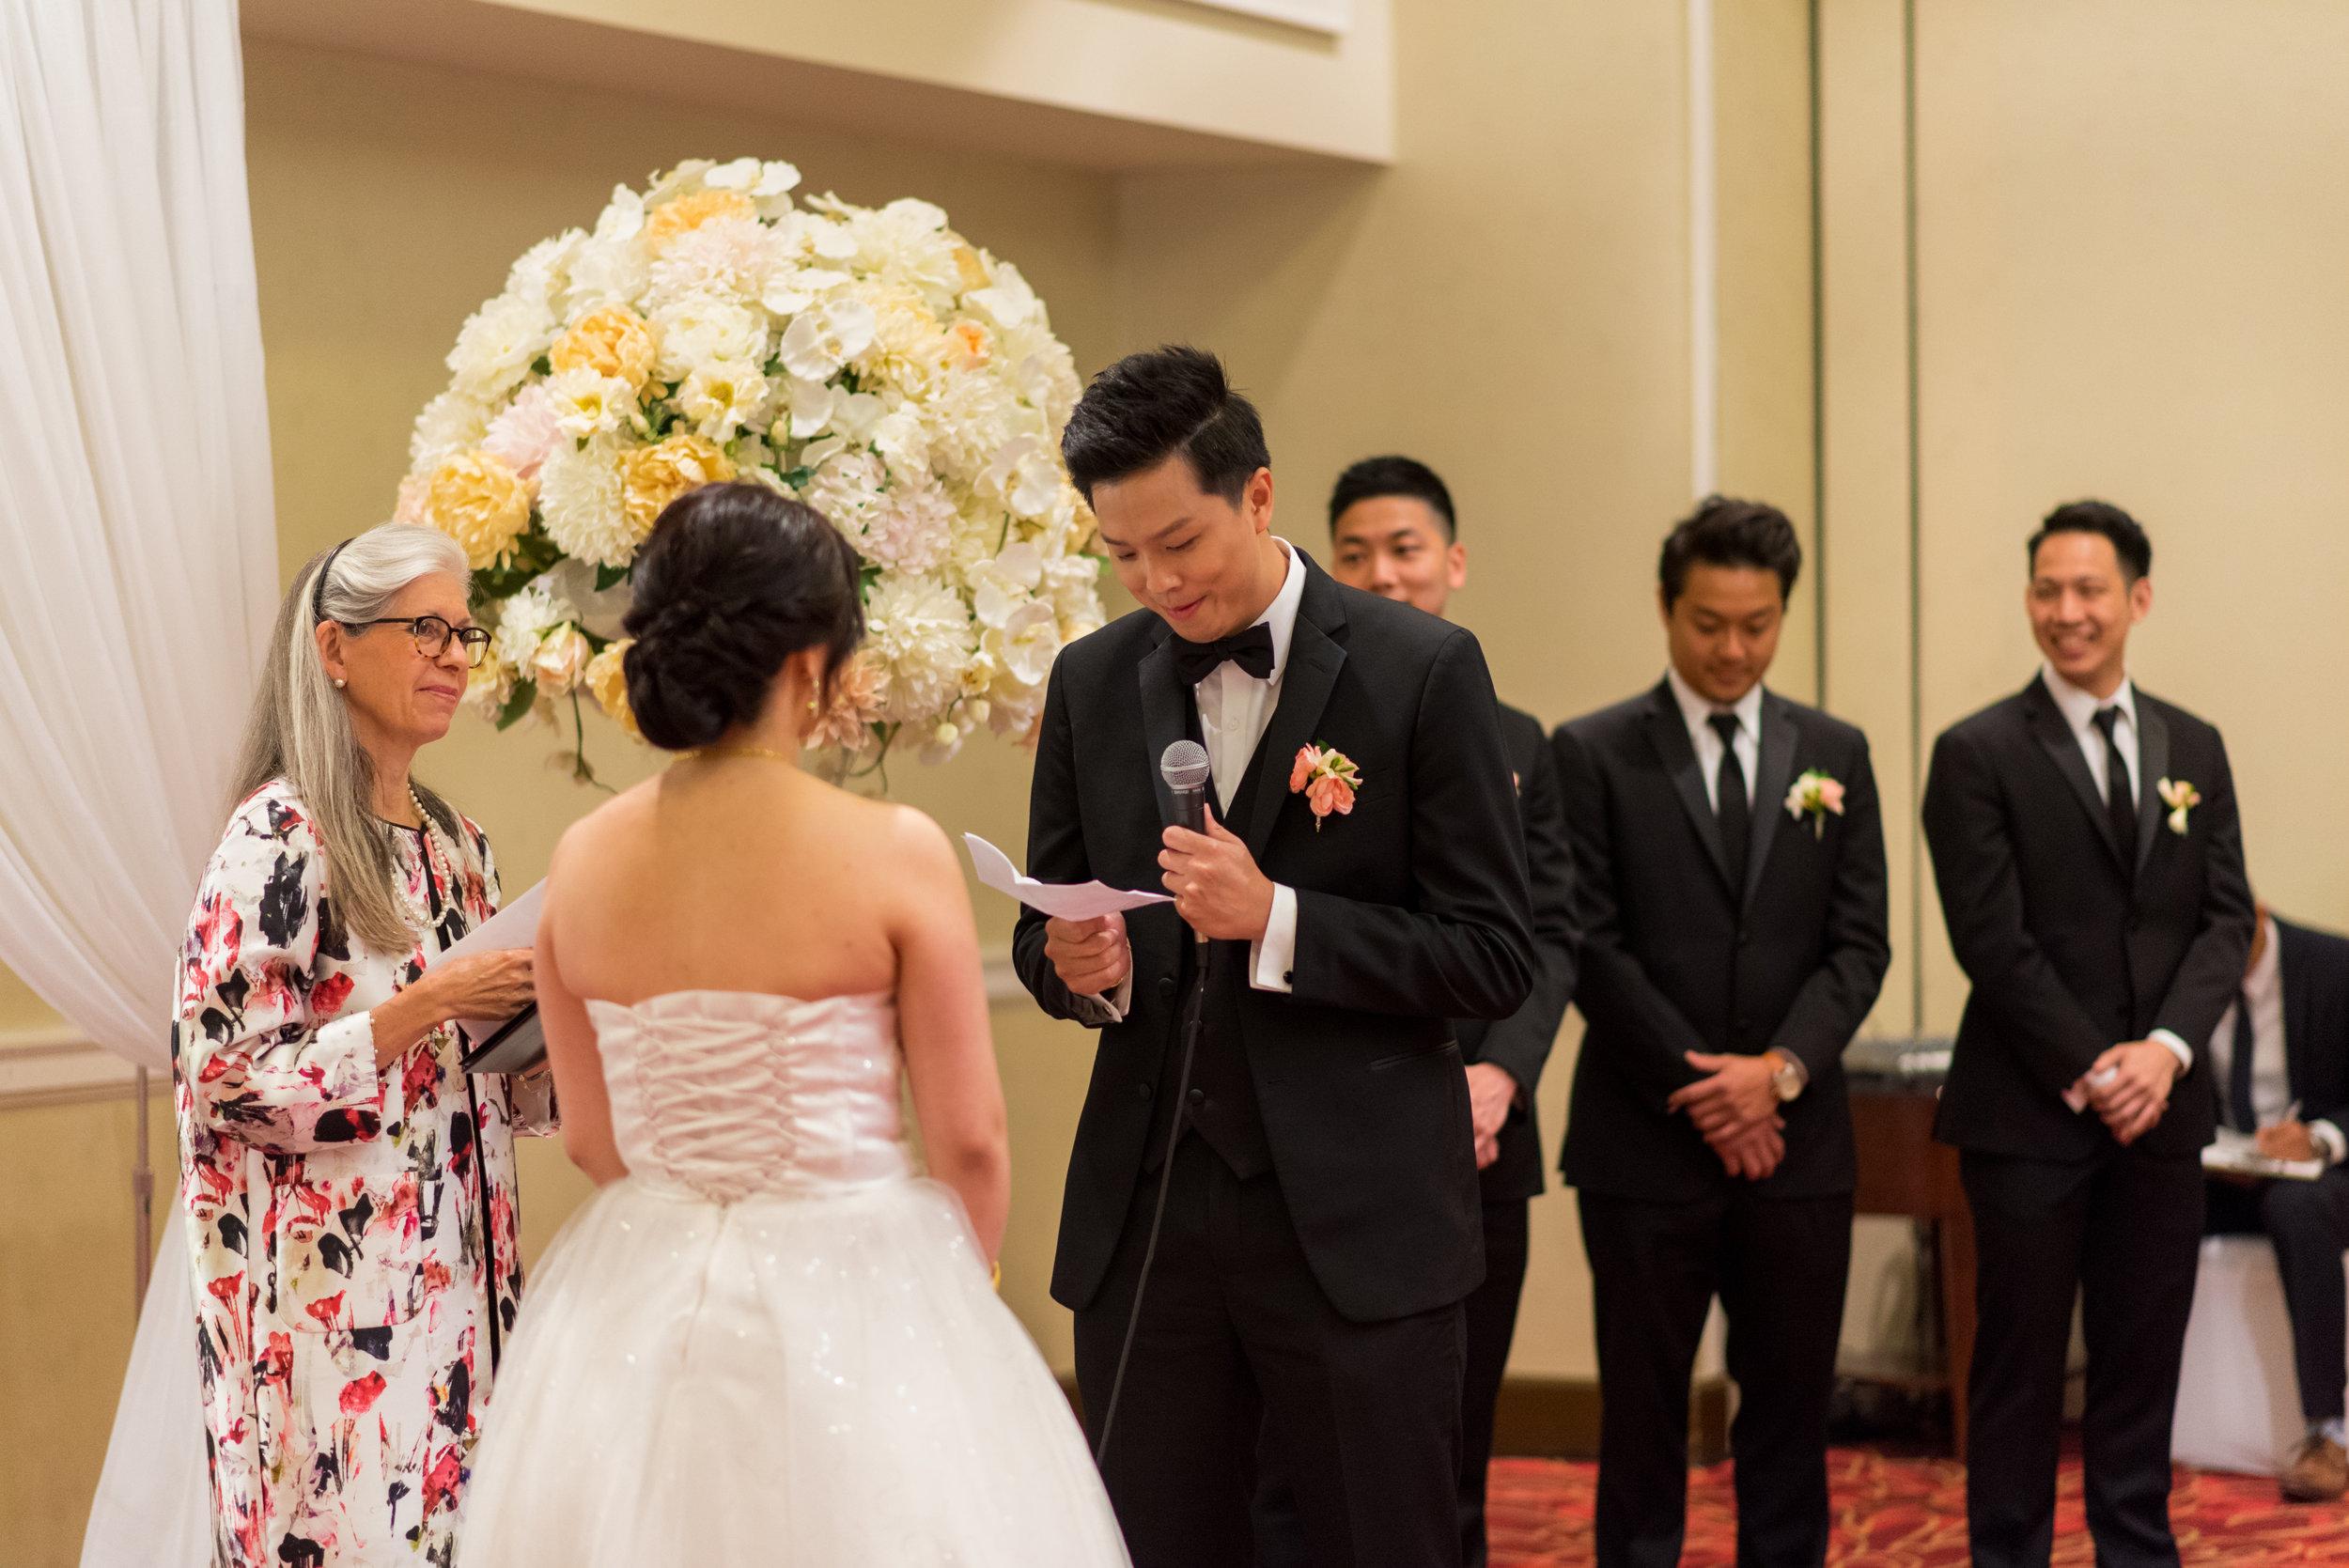 Yessica and Sam s Wedding-02 Ceremony-0104.jpg